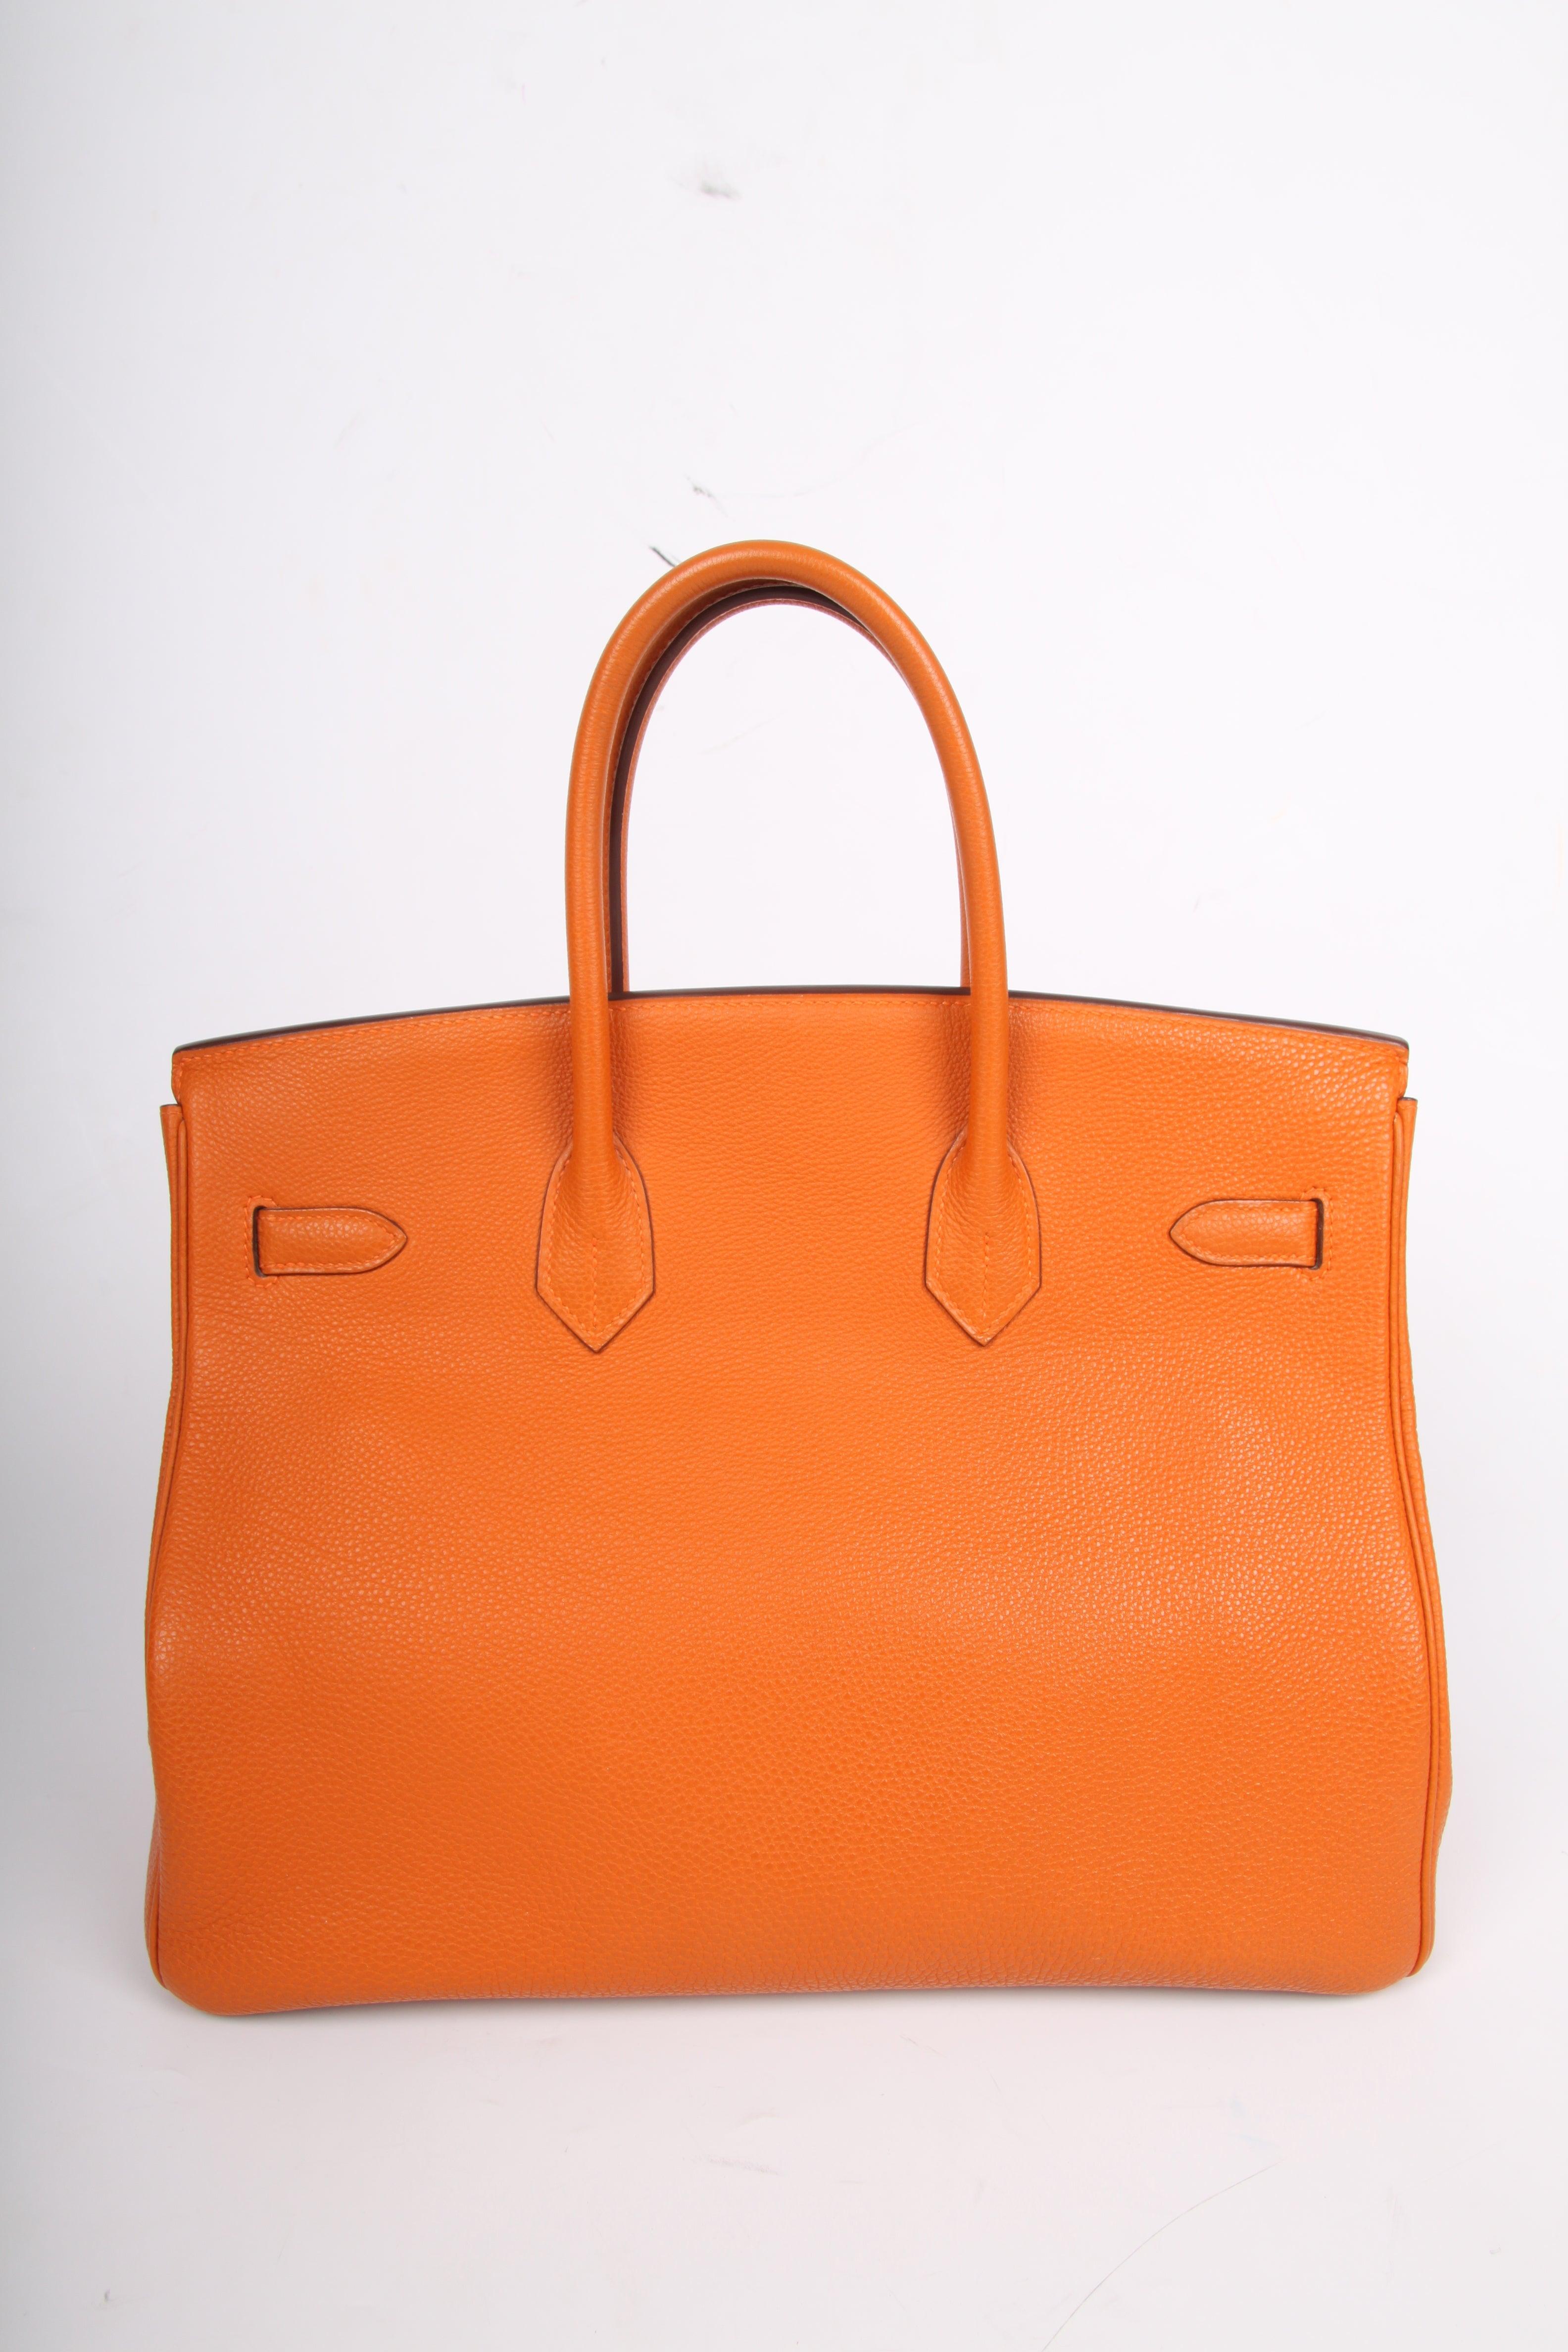 dcc768133236 Hermes Birkin Bag 35 Togo Potiron - silvertone hardware For Sale at 1stdibs